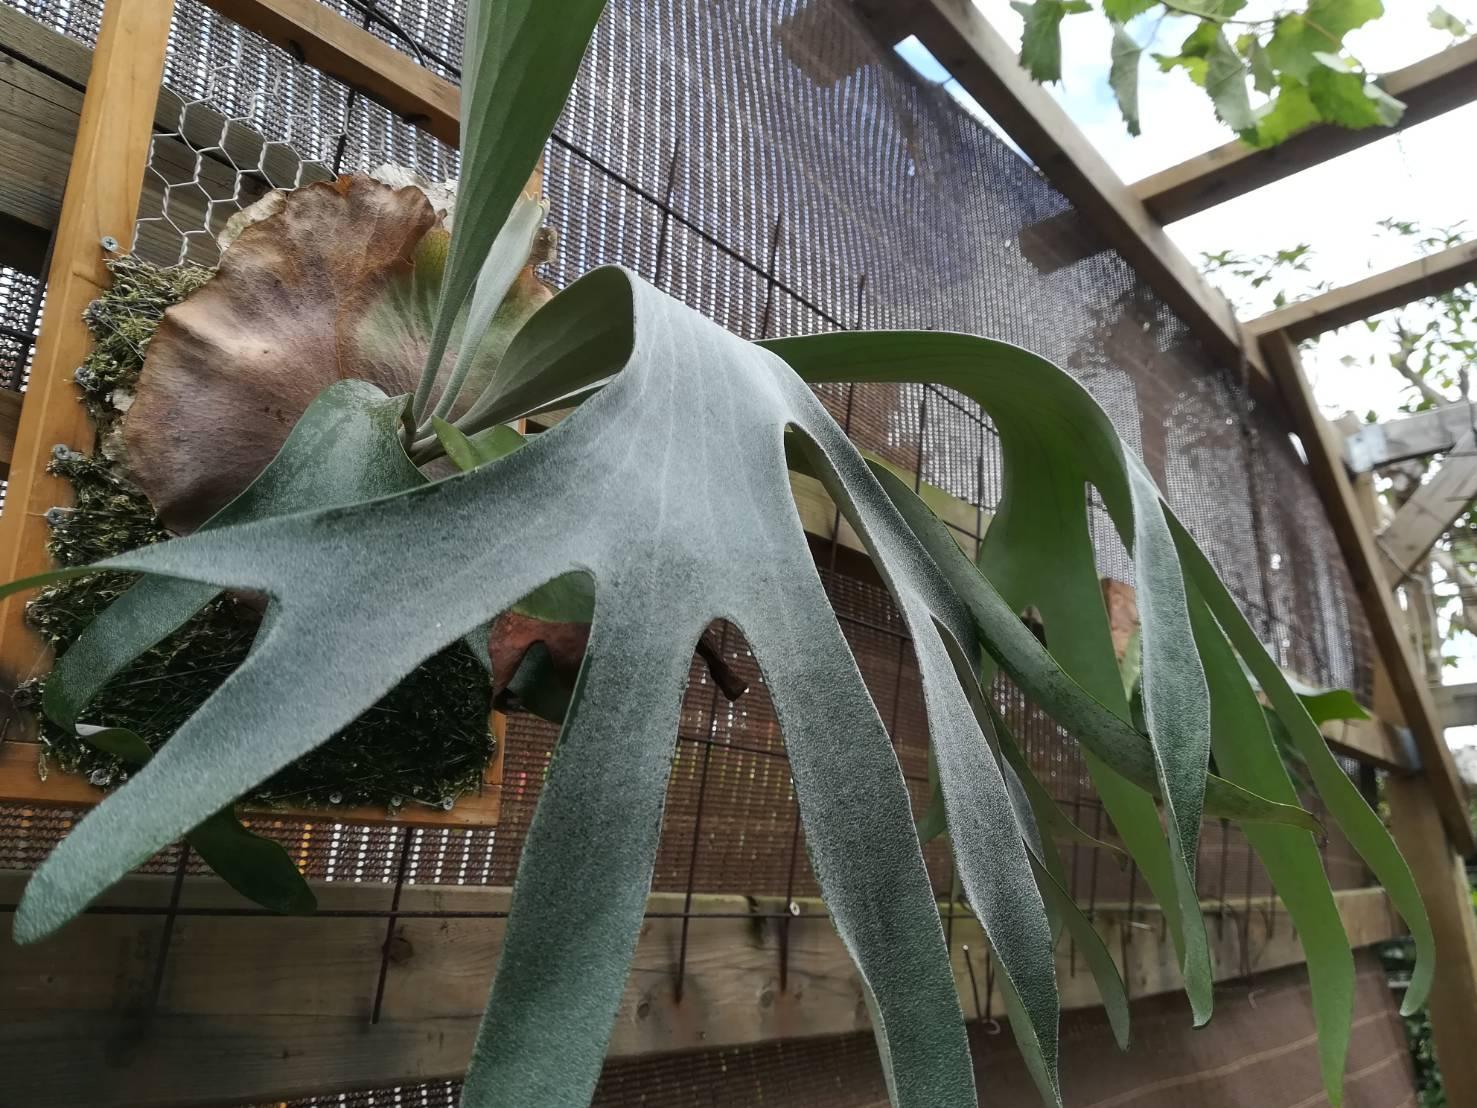 P.Pegasusの胞子葉が白くて美しい。≪ビカクシダ×7か月目×子株大発生中≫